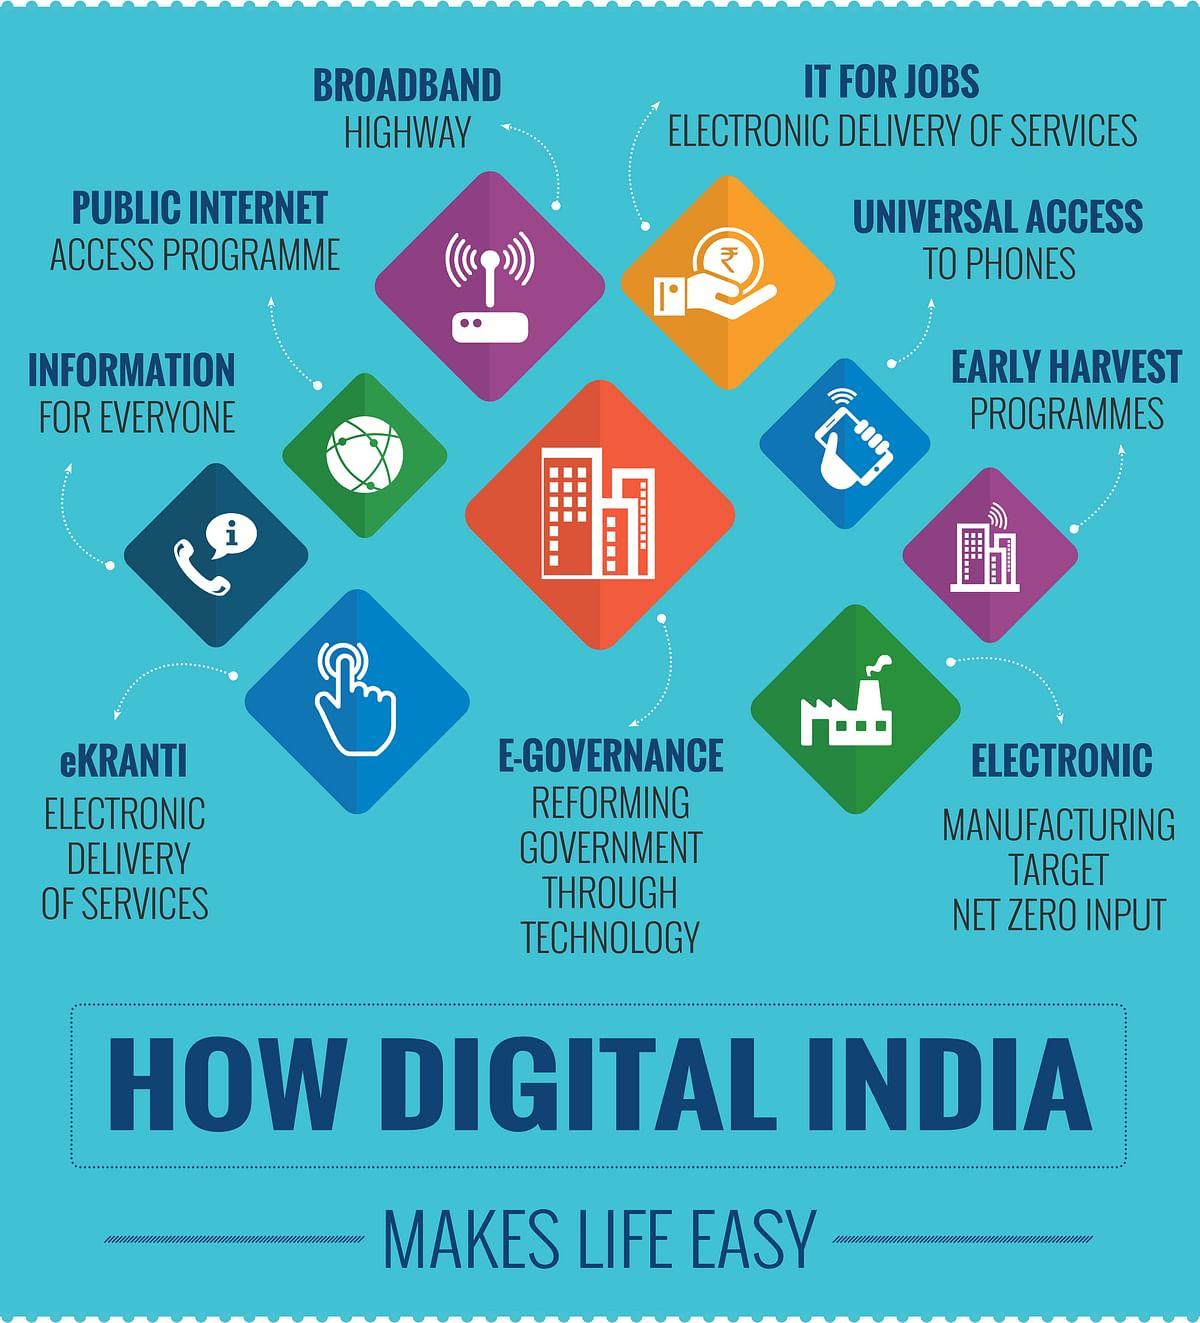 "Taking India into the future Source: <a href=""http://www.bharatniti.in/"">bharatniti.in</a>"